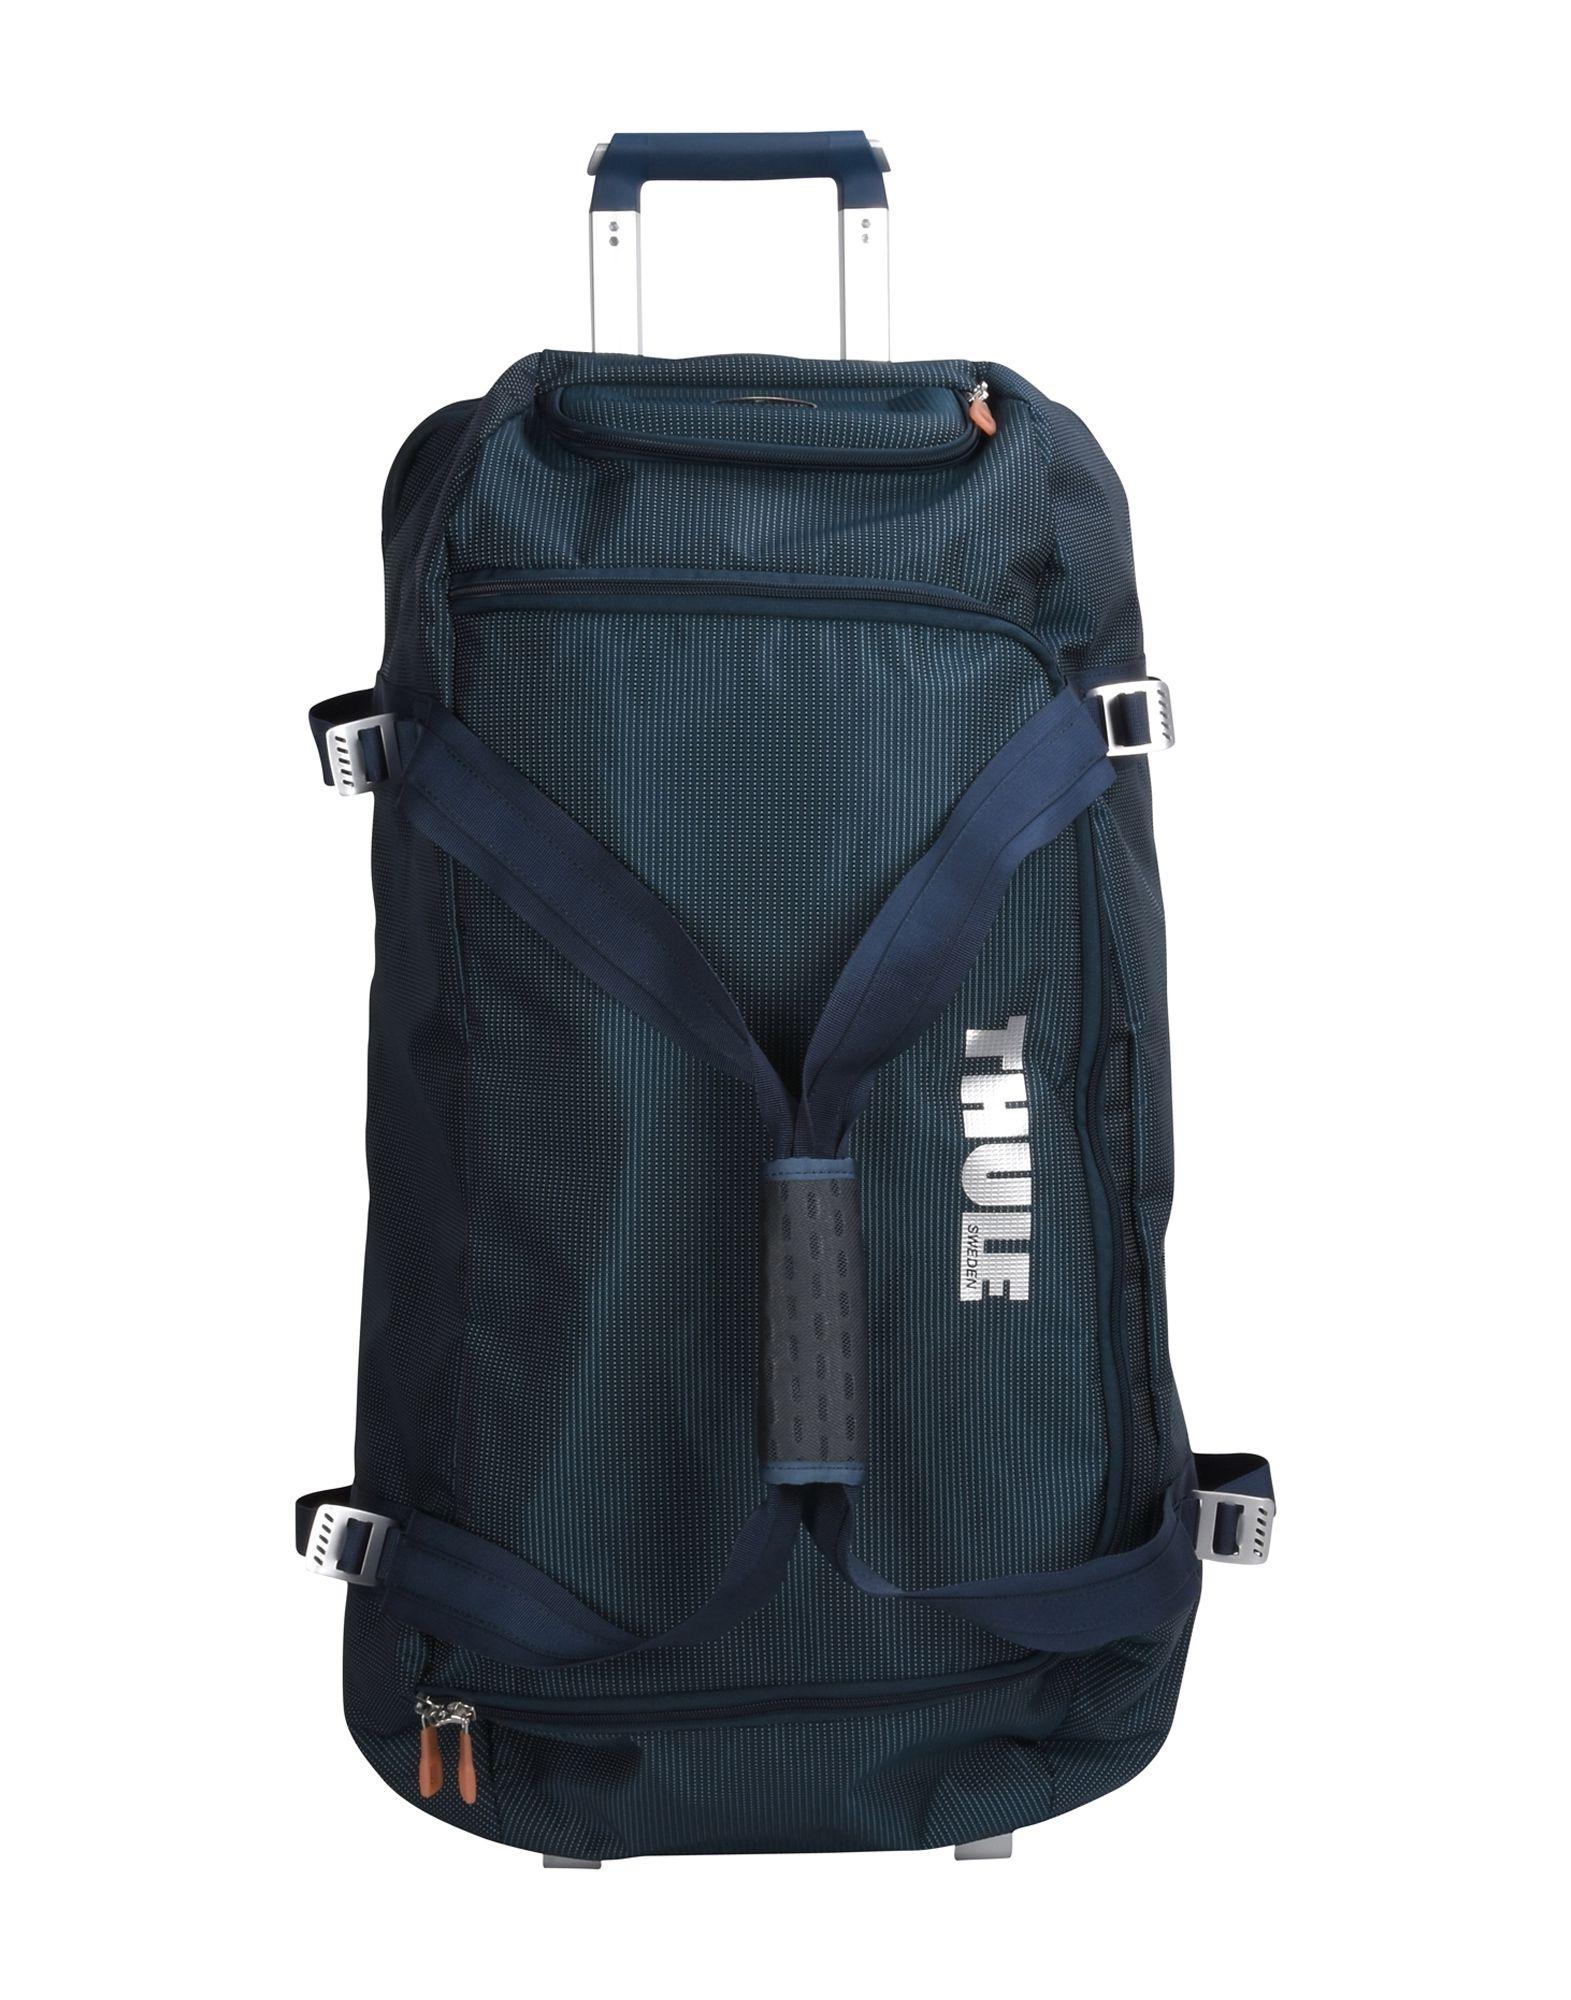 THULE® Чемодан/сумка на колесиках чемоданы thule дорожная сумка на колесах thule crossover